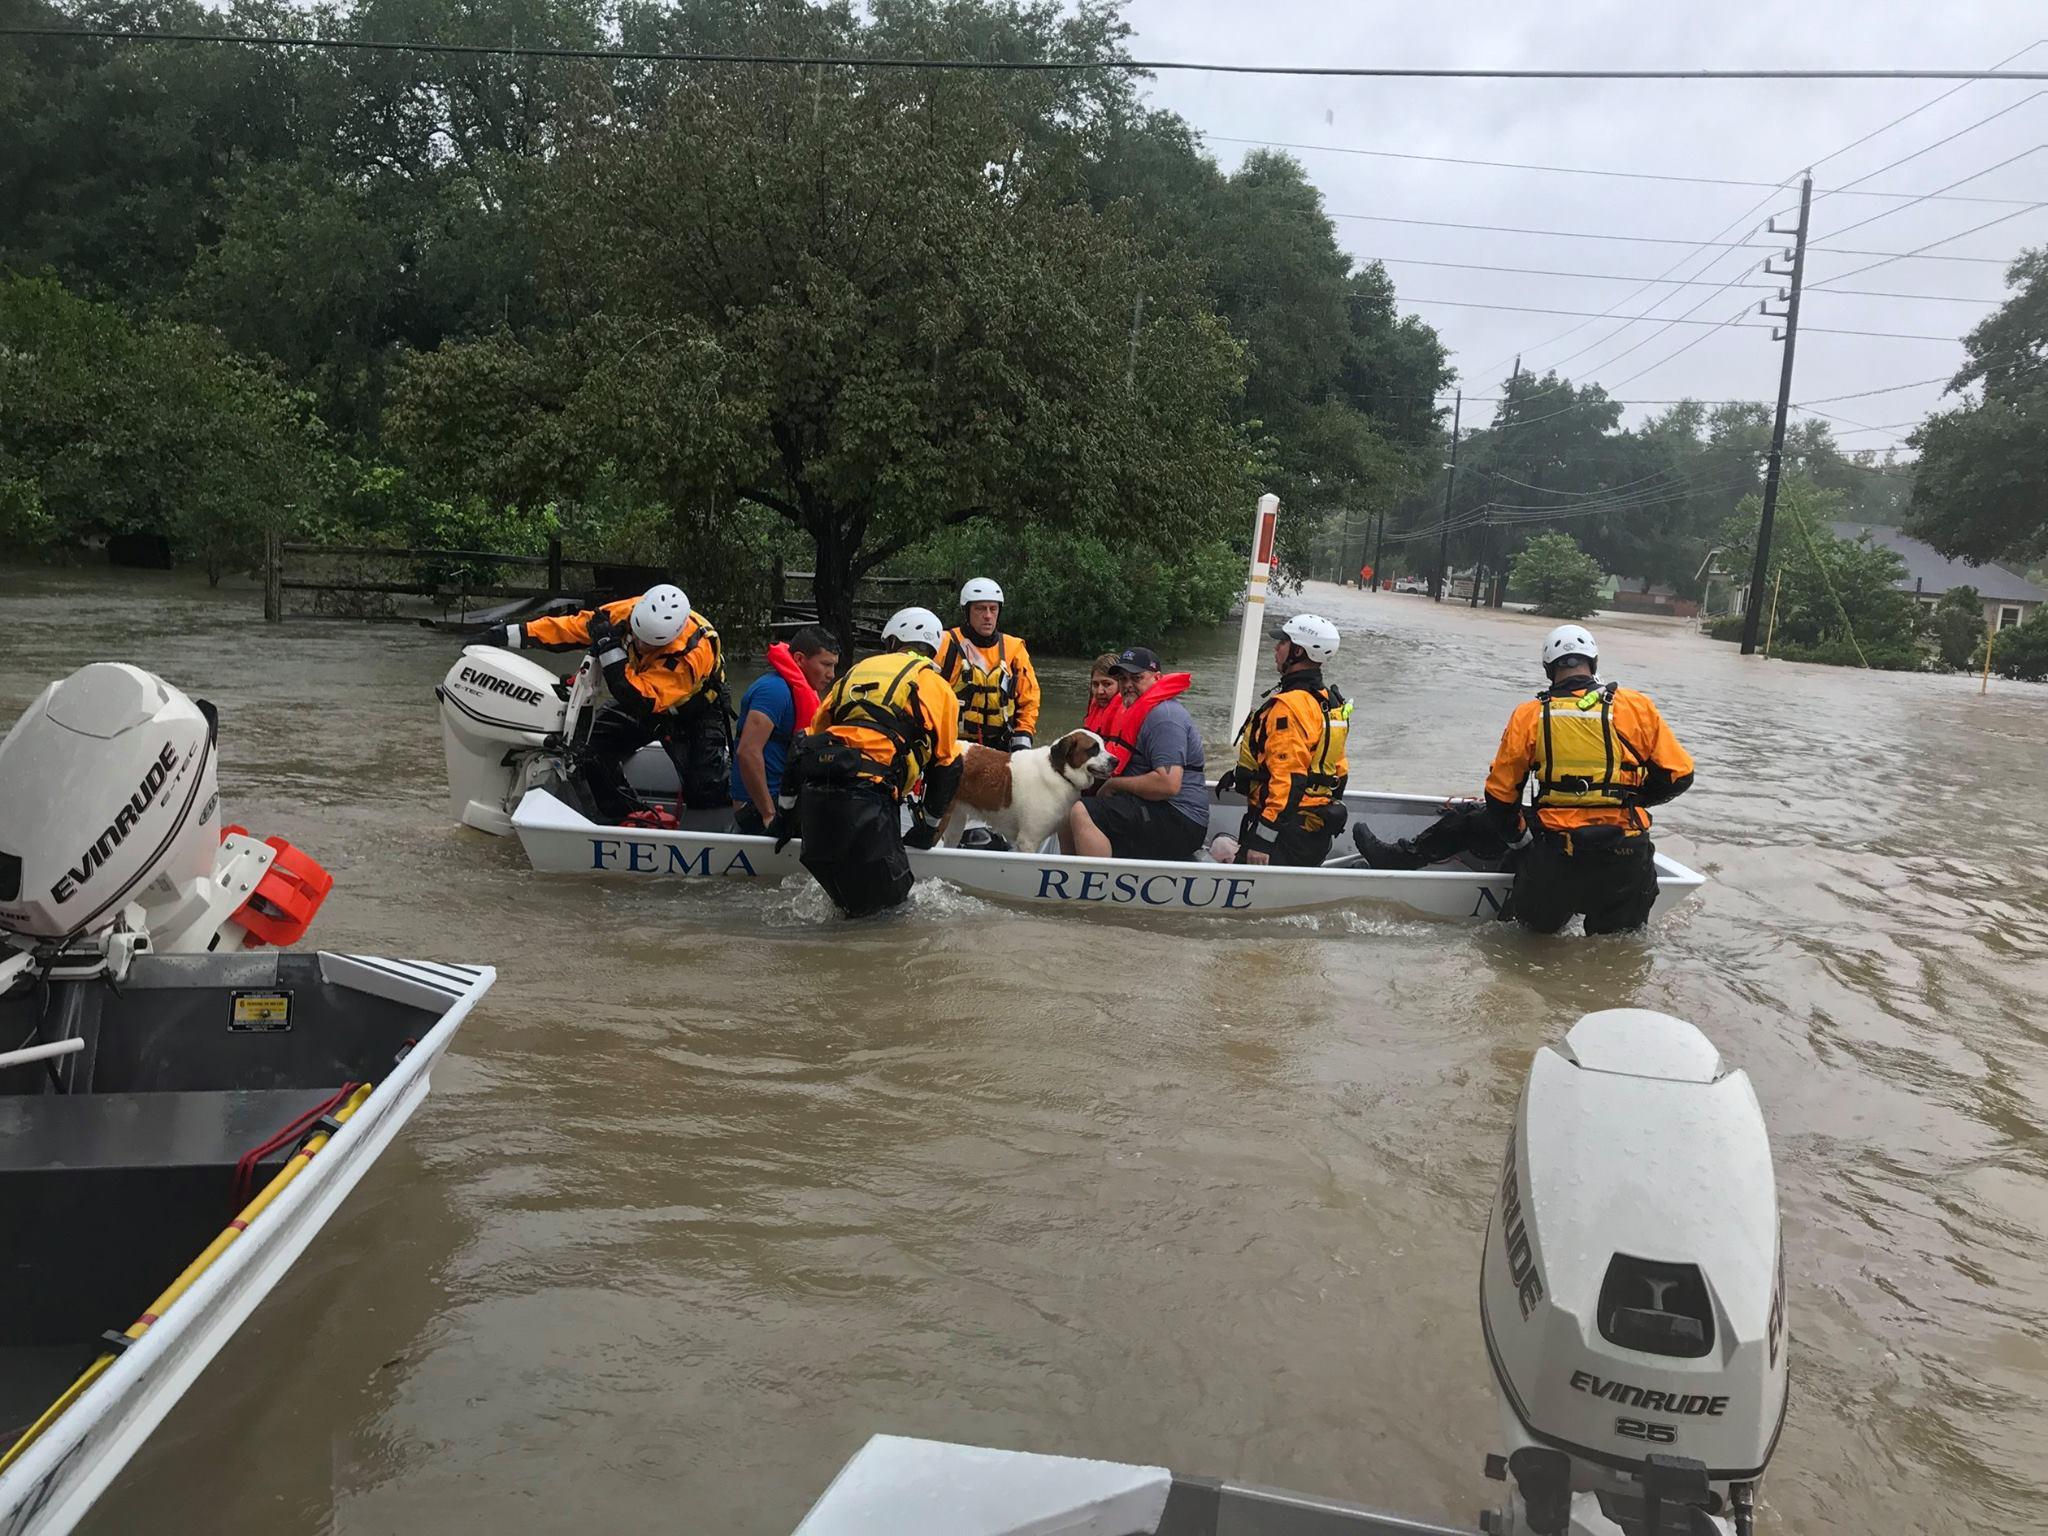 Professionals and volunteers come together to rescue hurricane survivors. PC: facebook.com/nebraskaTF1